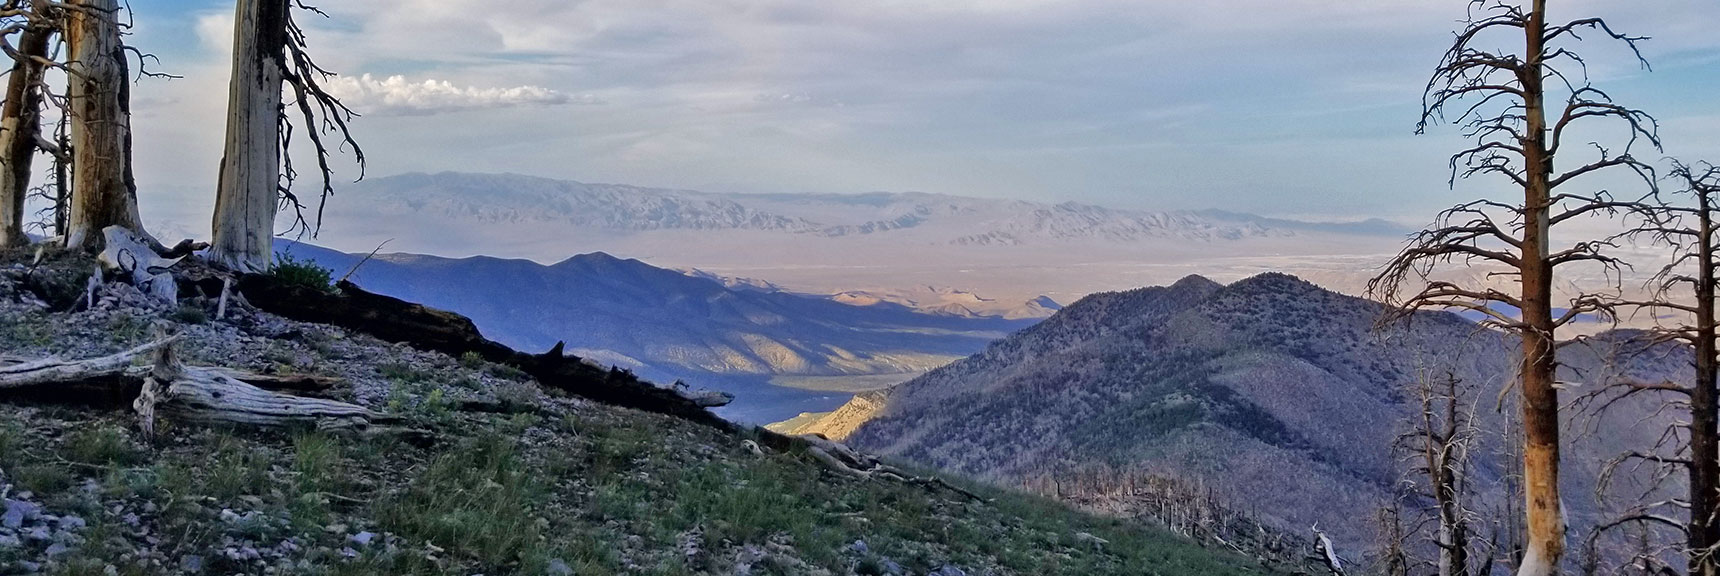 Harris Mountain Viewed Down Griffith Peak North Ridge. Sheep Range and Gass Peak in Background. | Six Peak Circuit Adventure in the Spring Mountains, Nevada